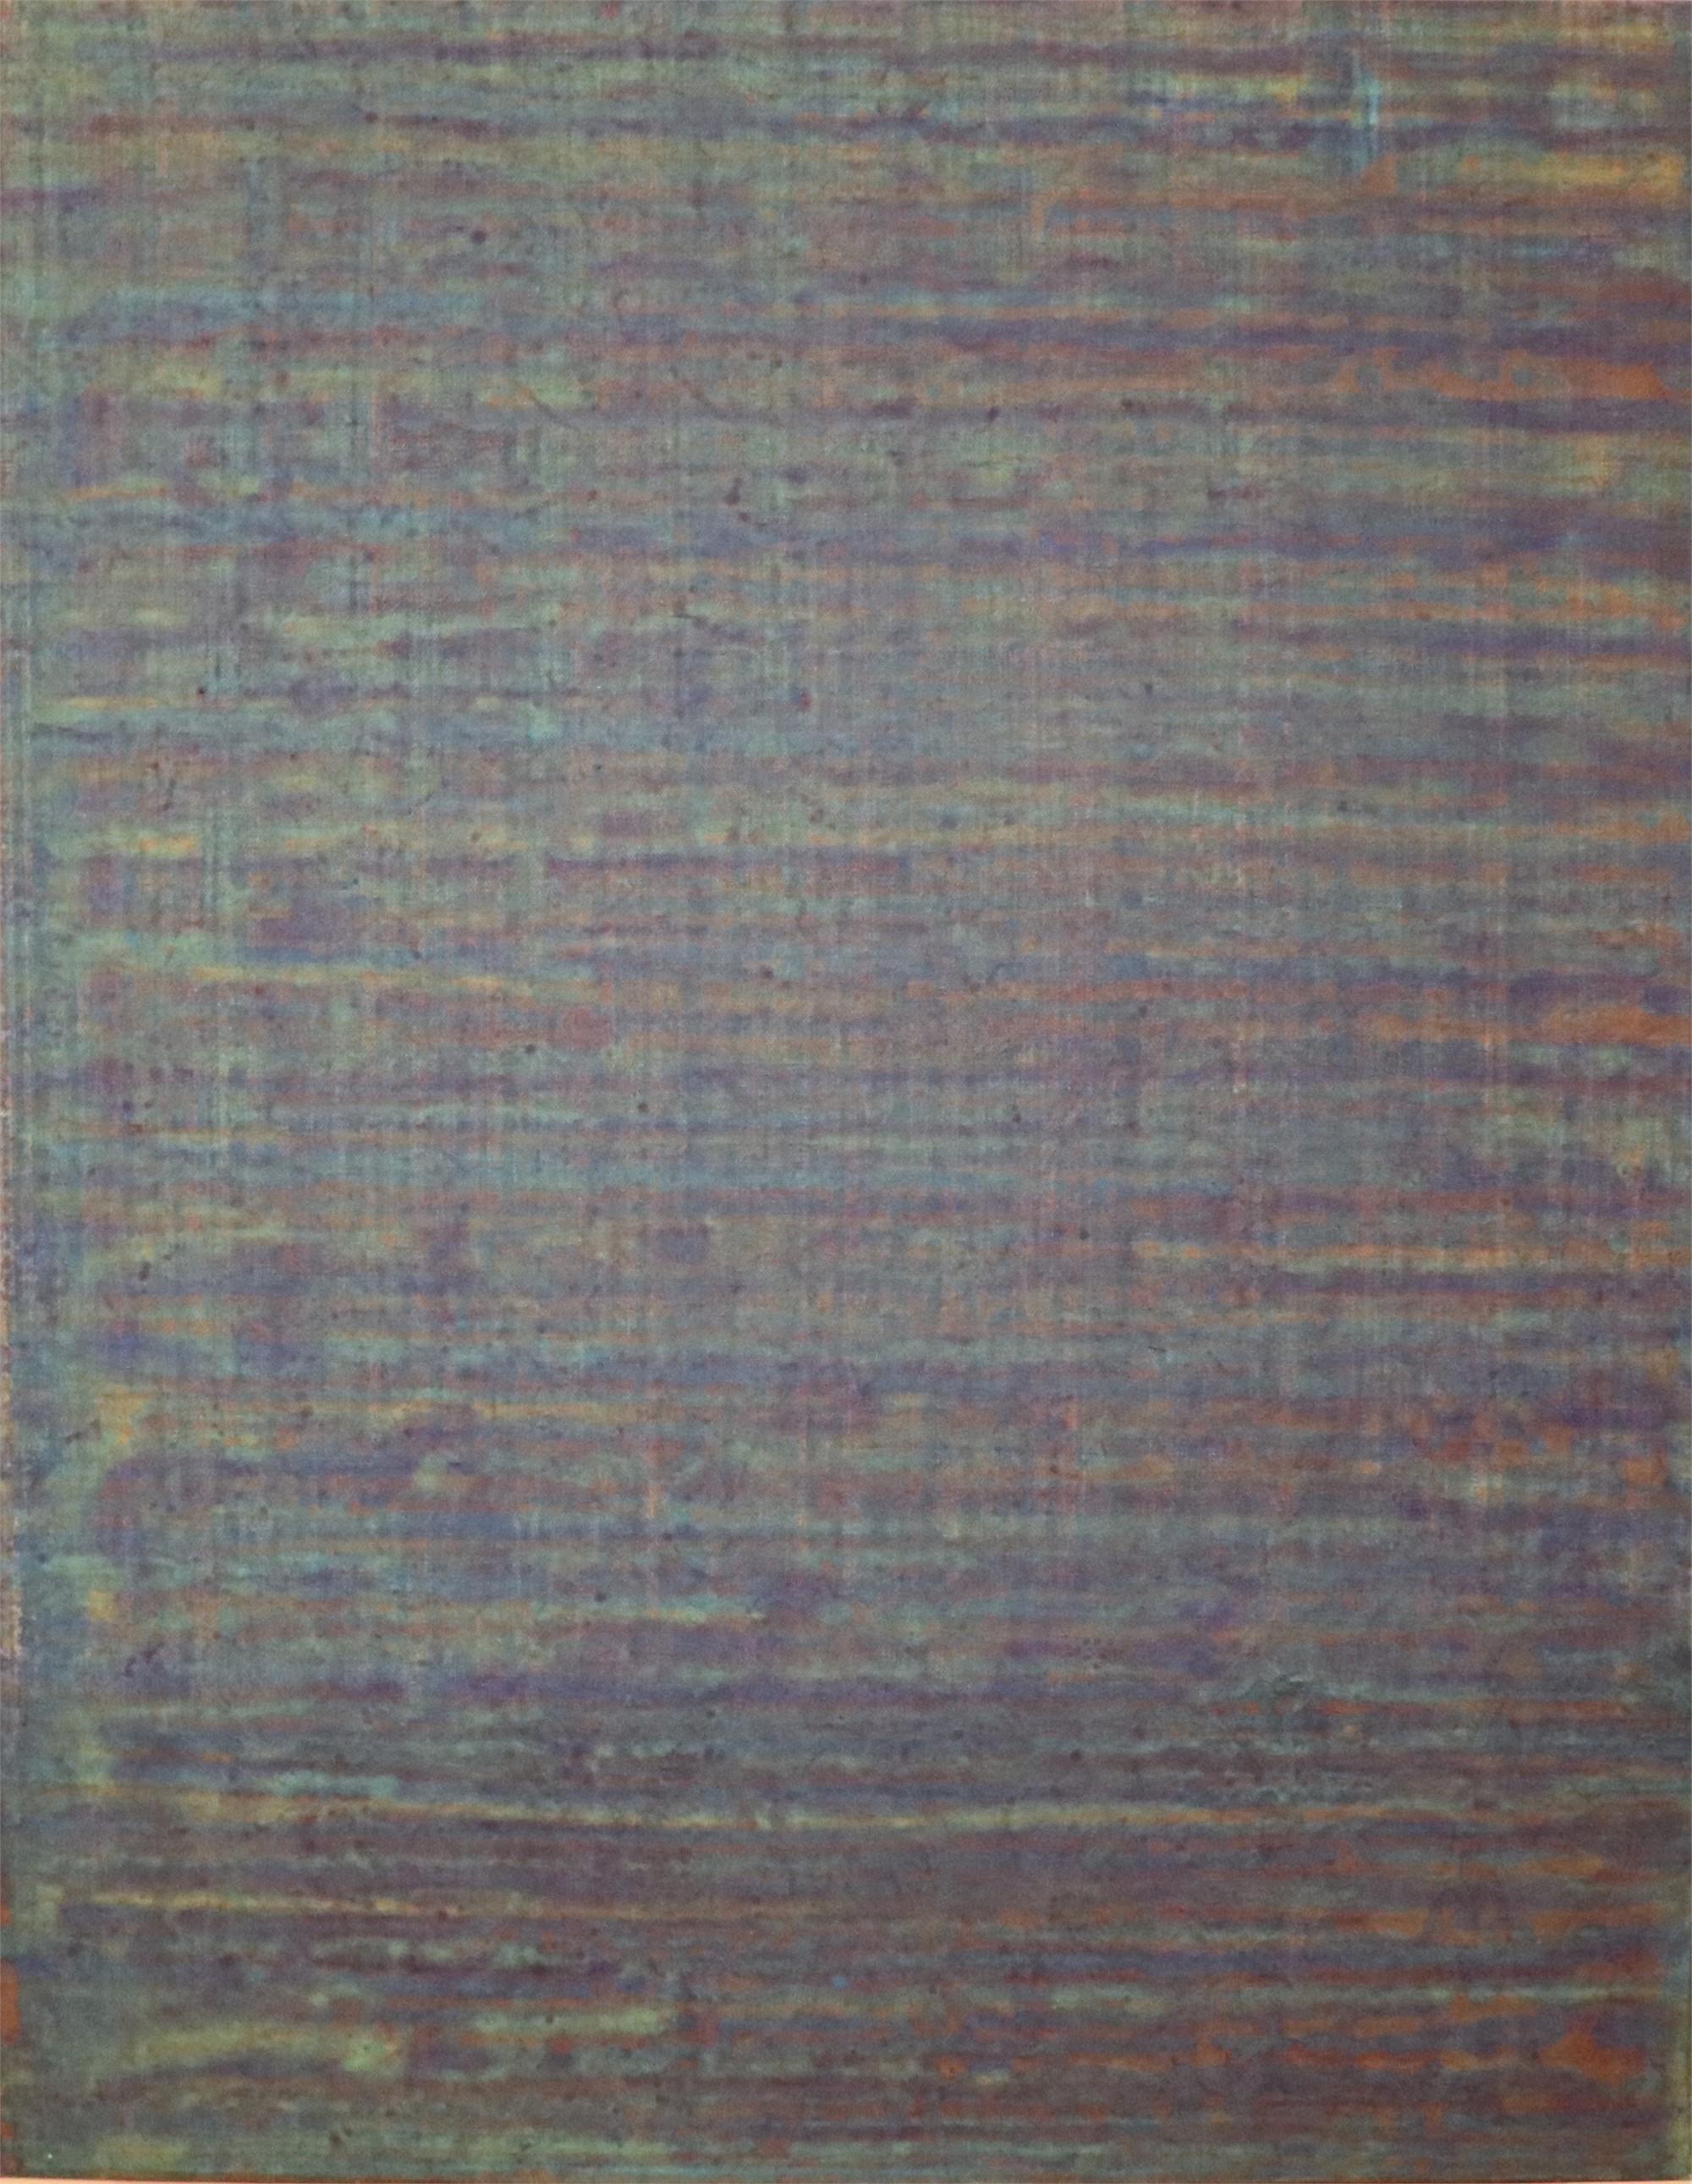 Lapis Tapestry II by Steven Anton Rehage